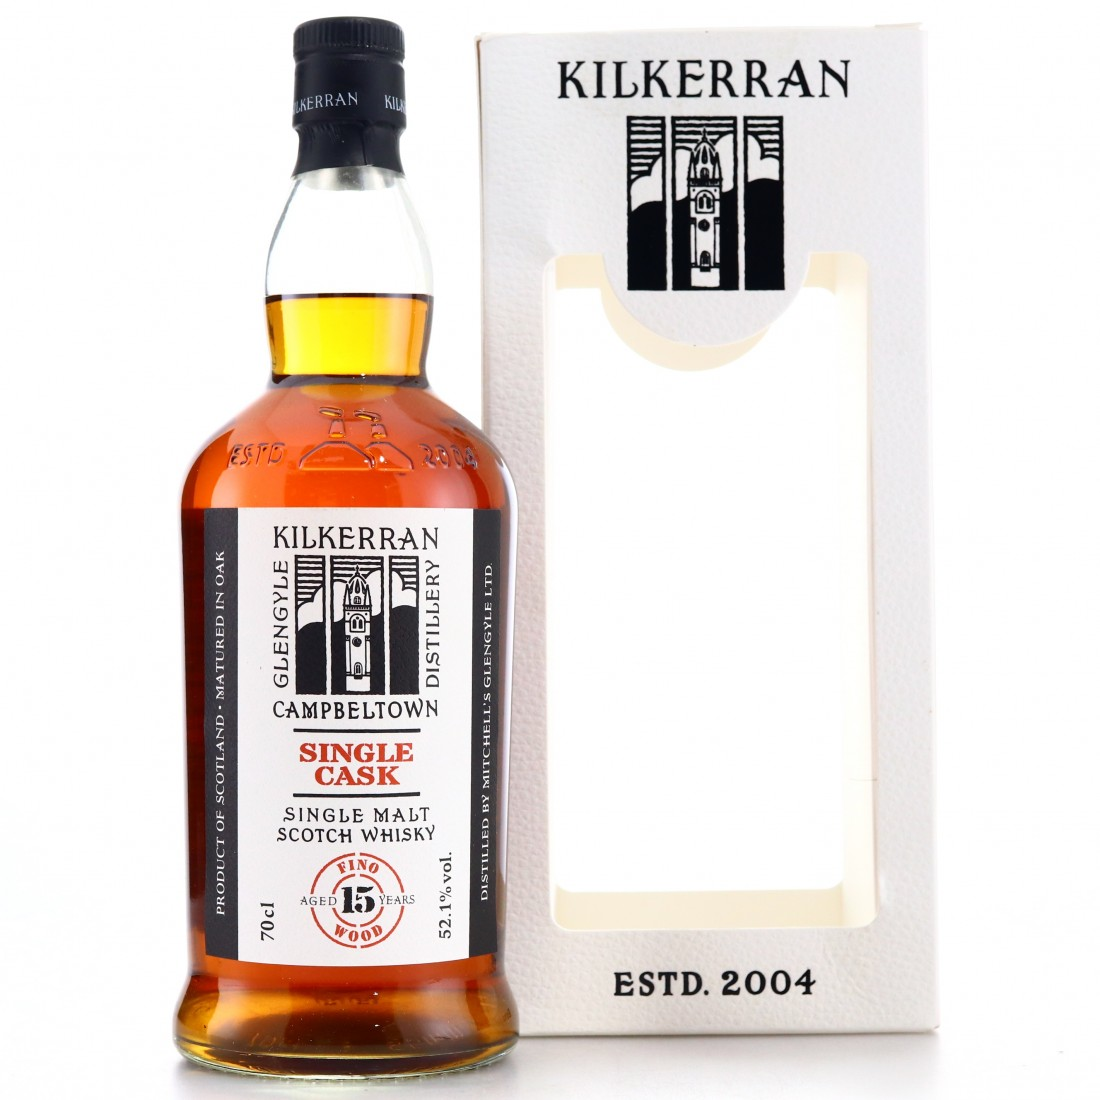 Kilkerran 2004 Single Fino Cask 15 Year Old / 15th Anniversary - The Nectar